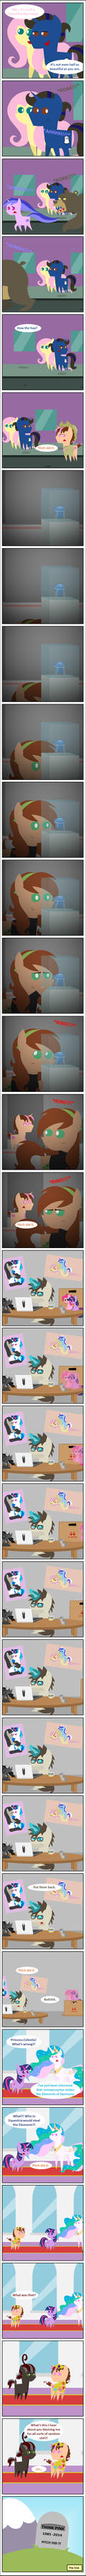 Equestria's Stories - RANDOM #5-2